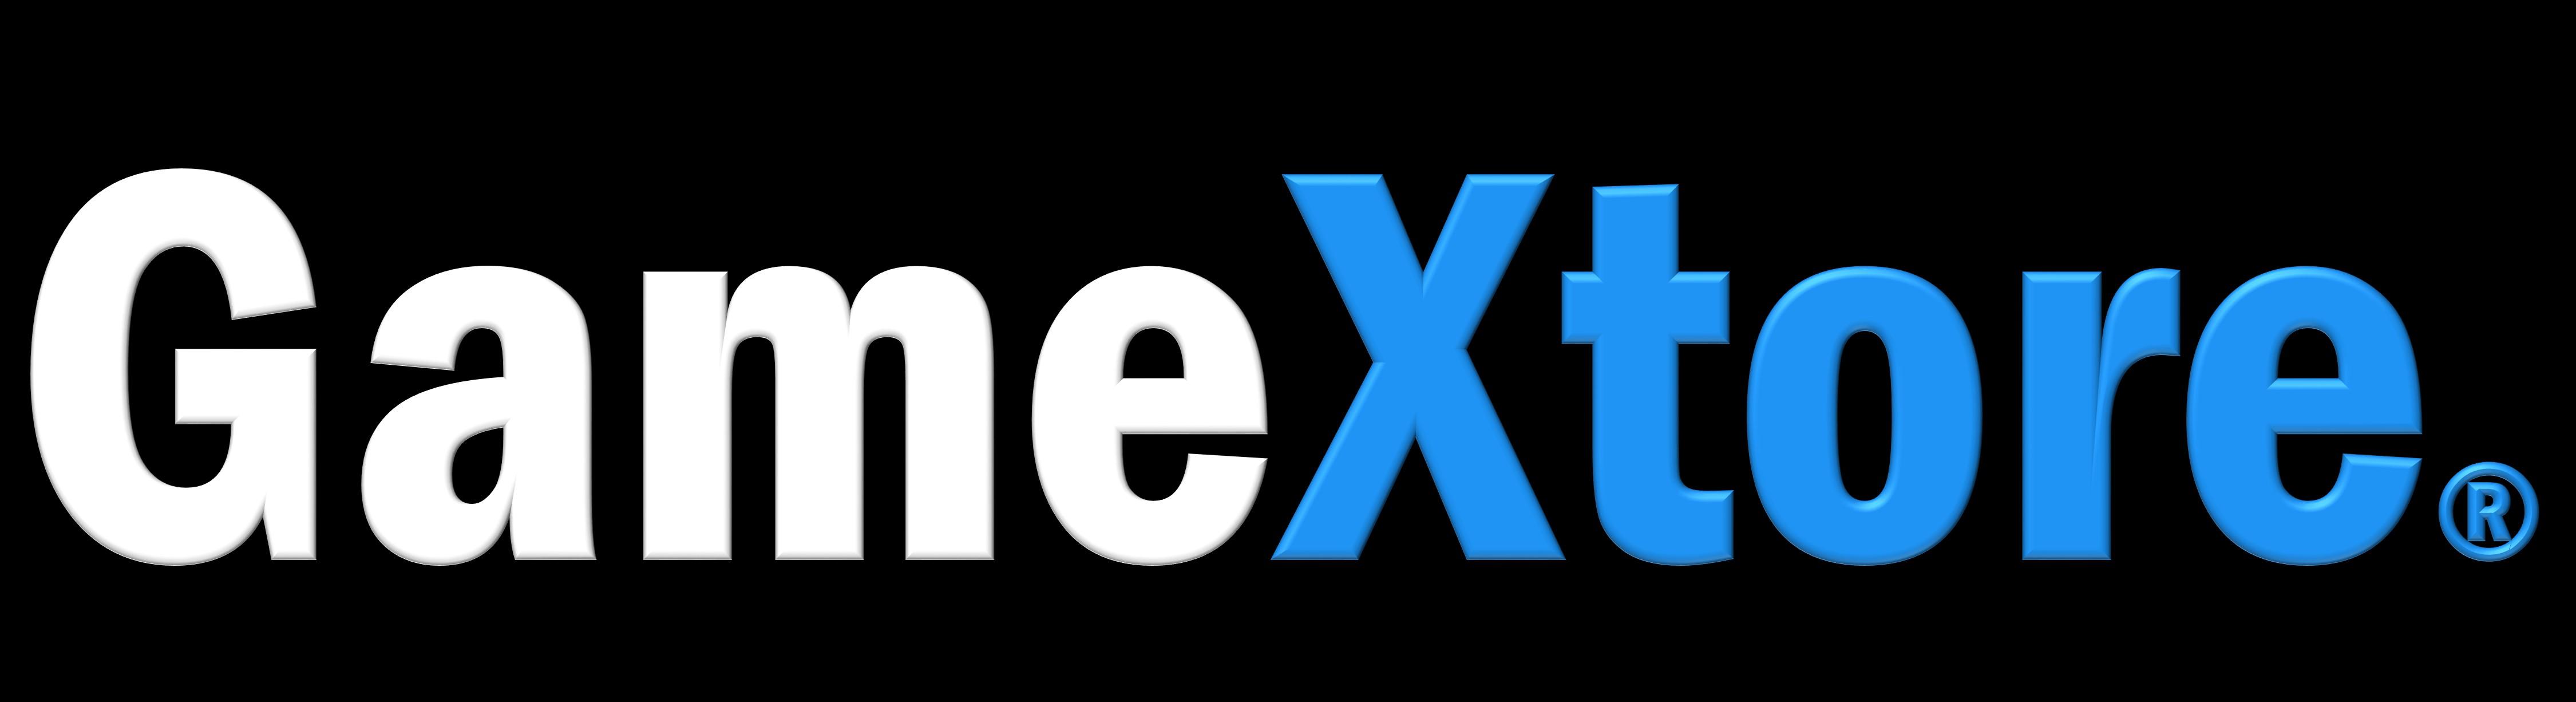 logotipo Gamextore png